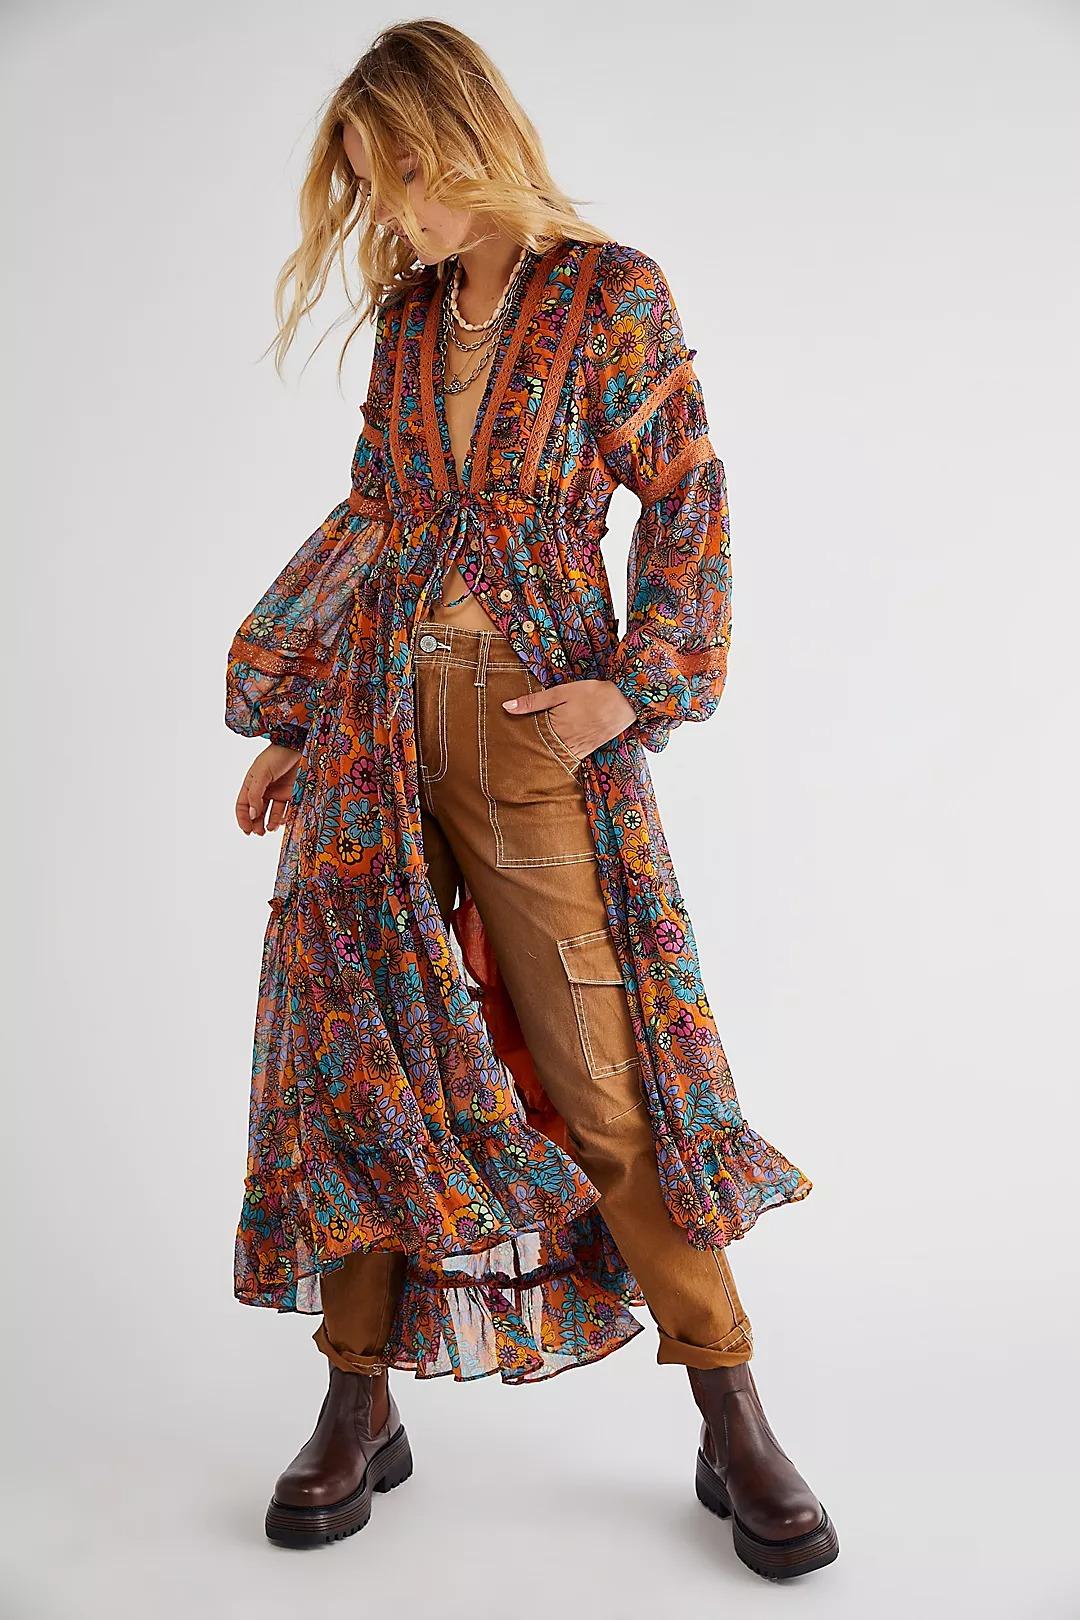 Boho Outfits: Colorful maxi dress